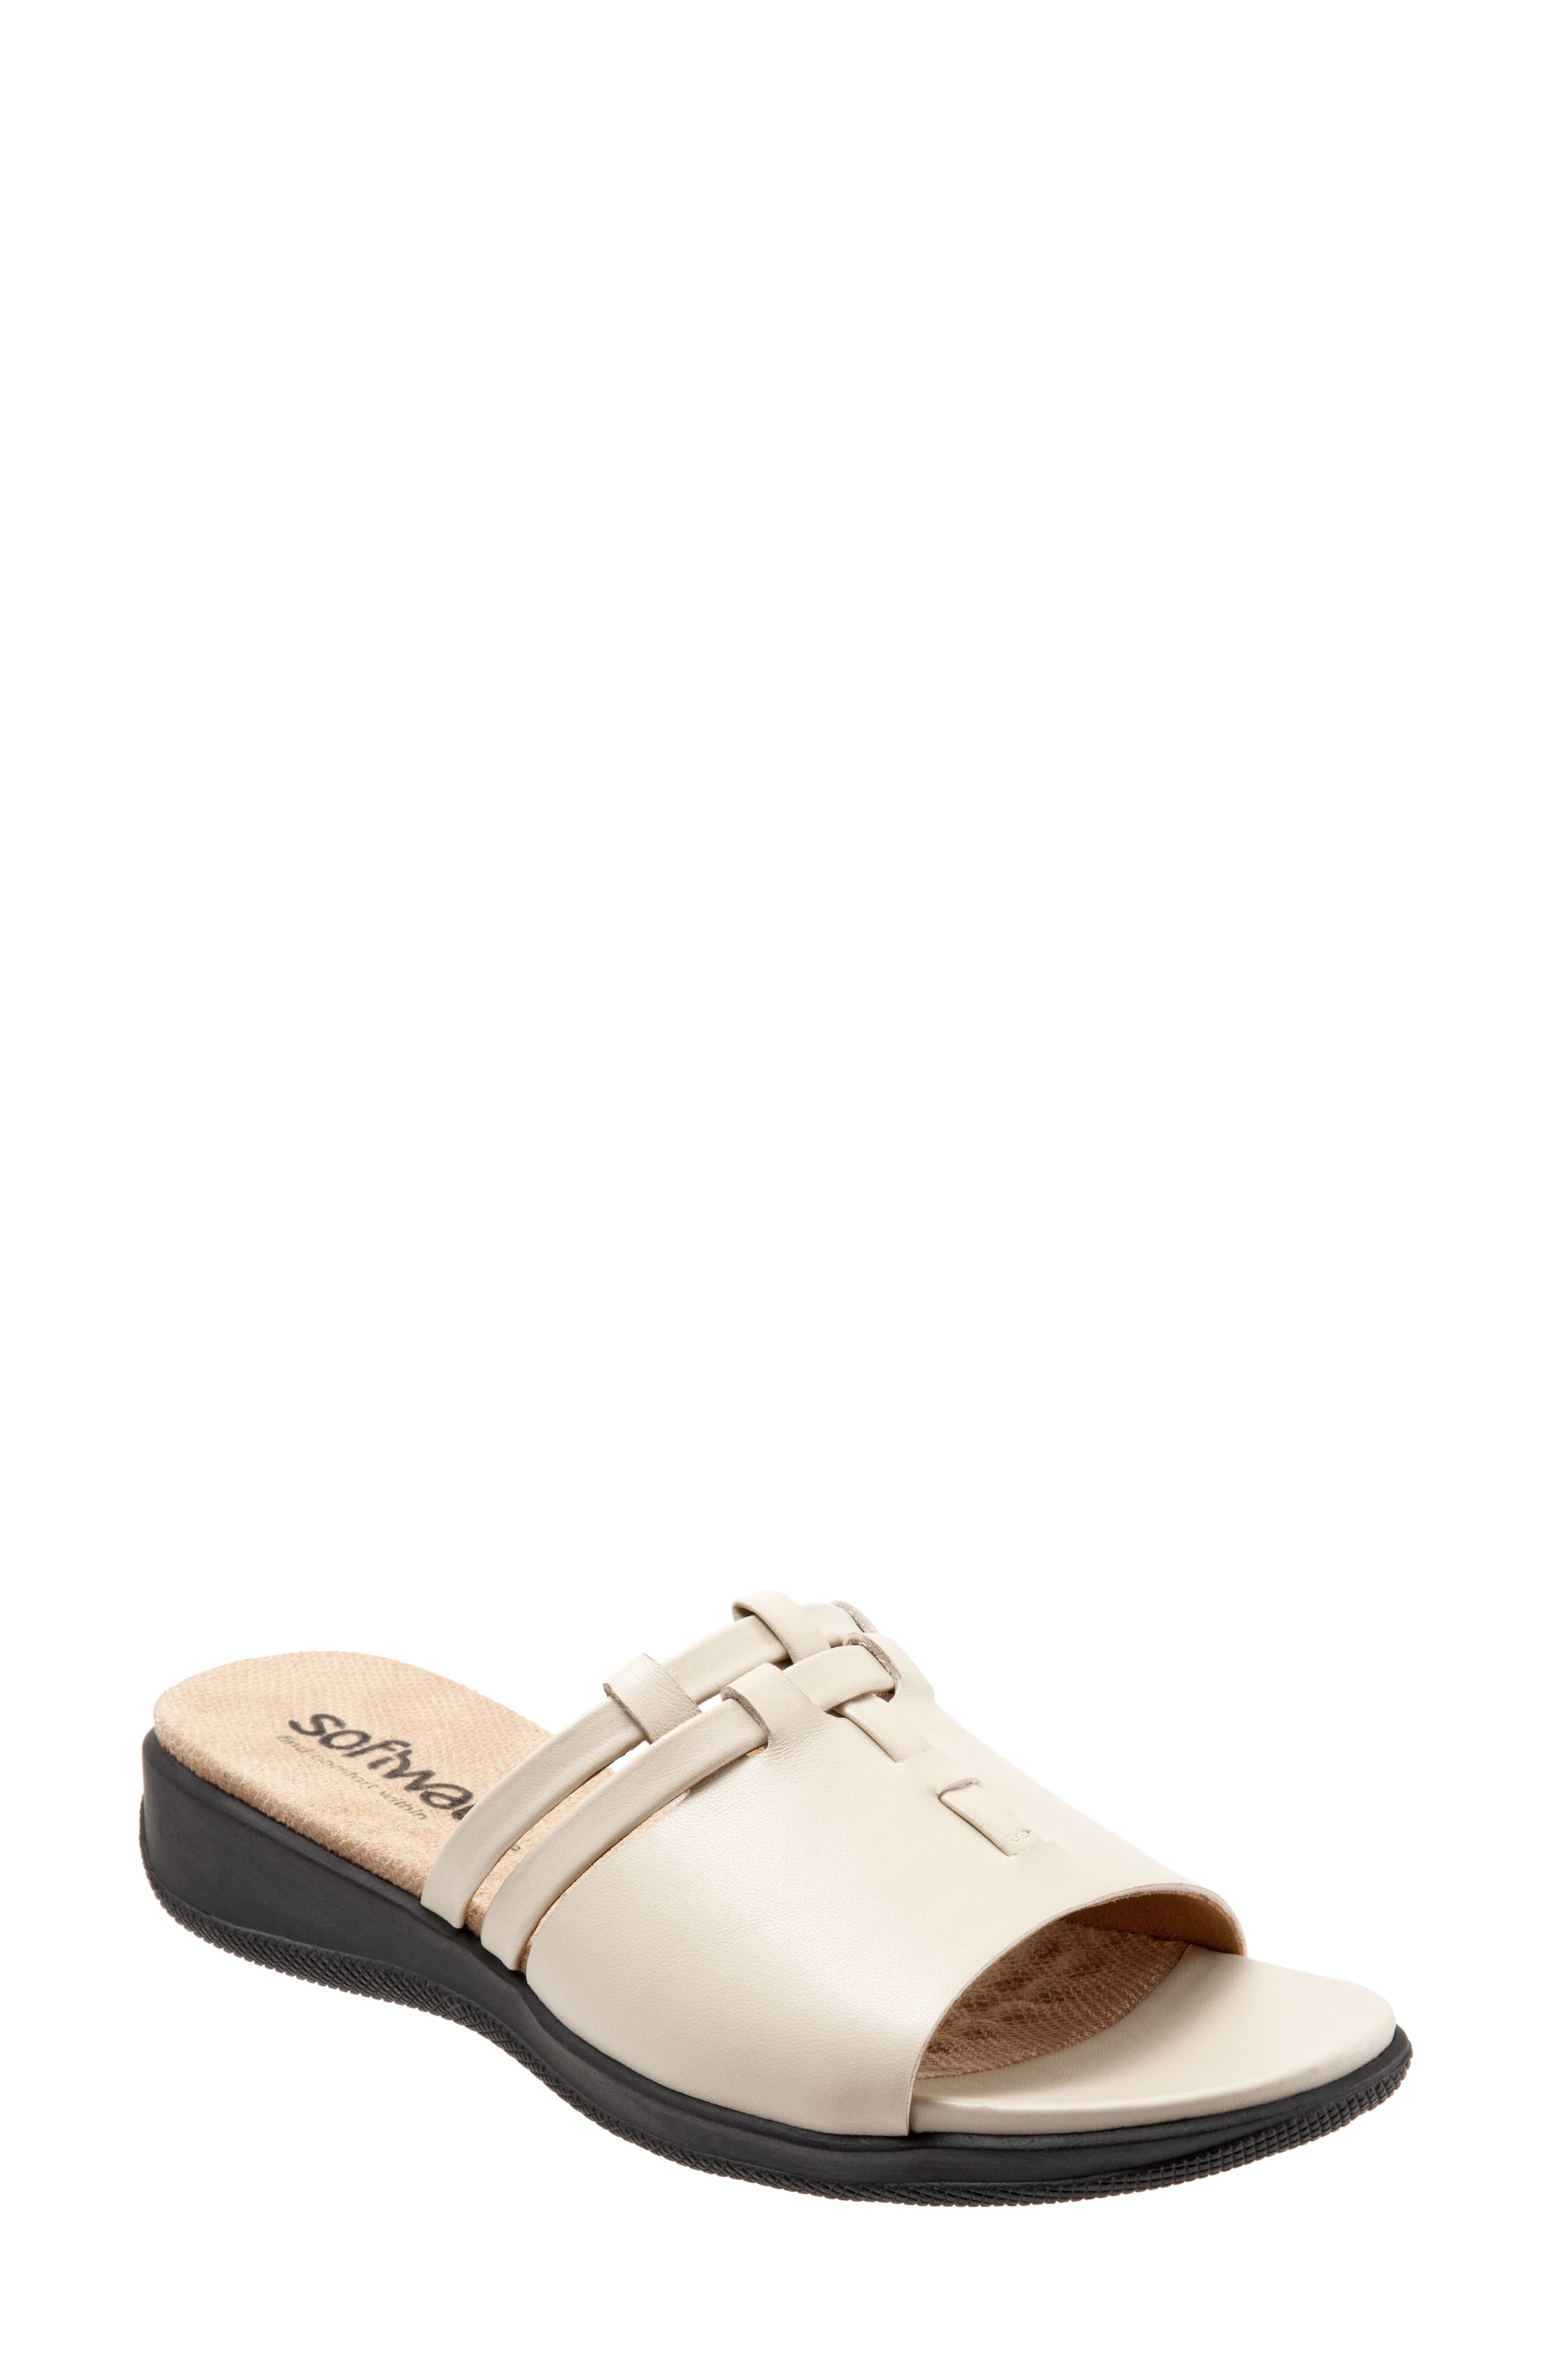 Women's SoftWalk® Shoes Sale